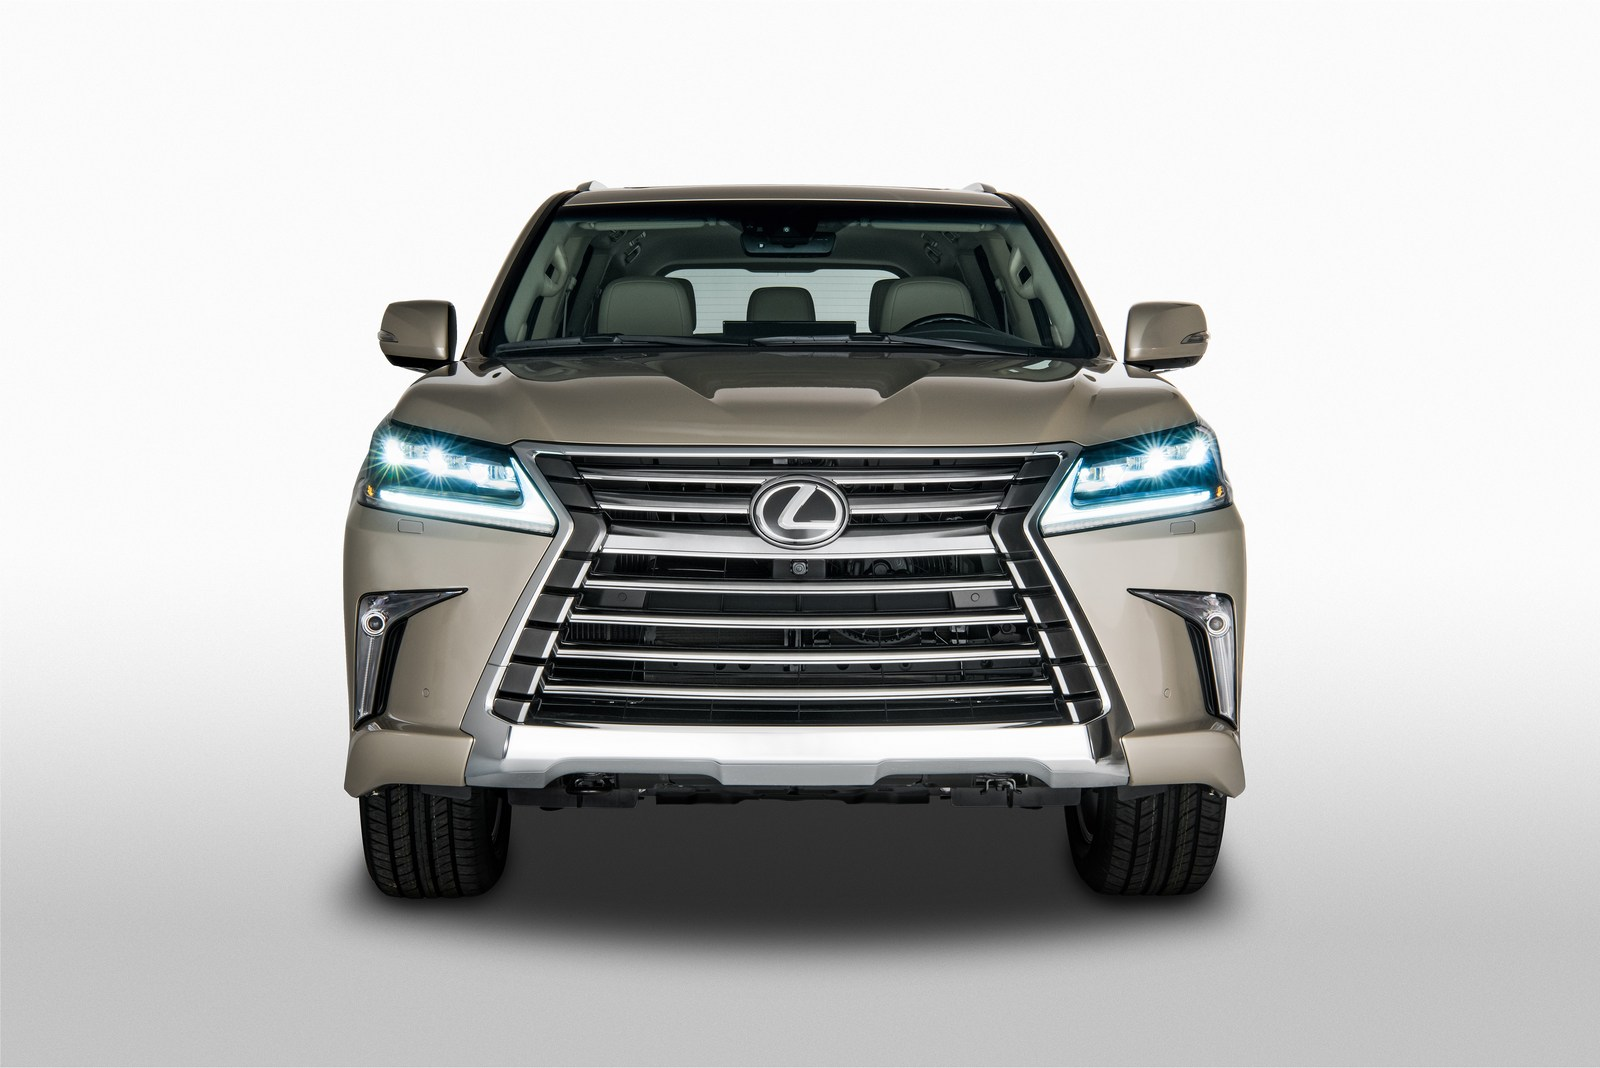 Lexus LX 570 2018 (2)